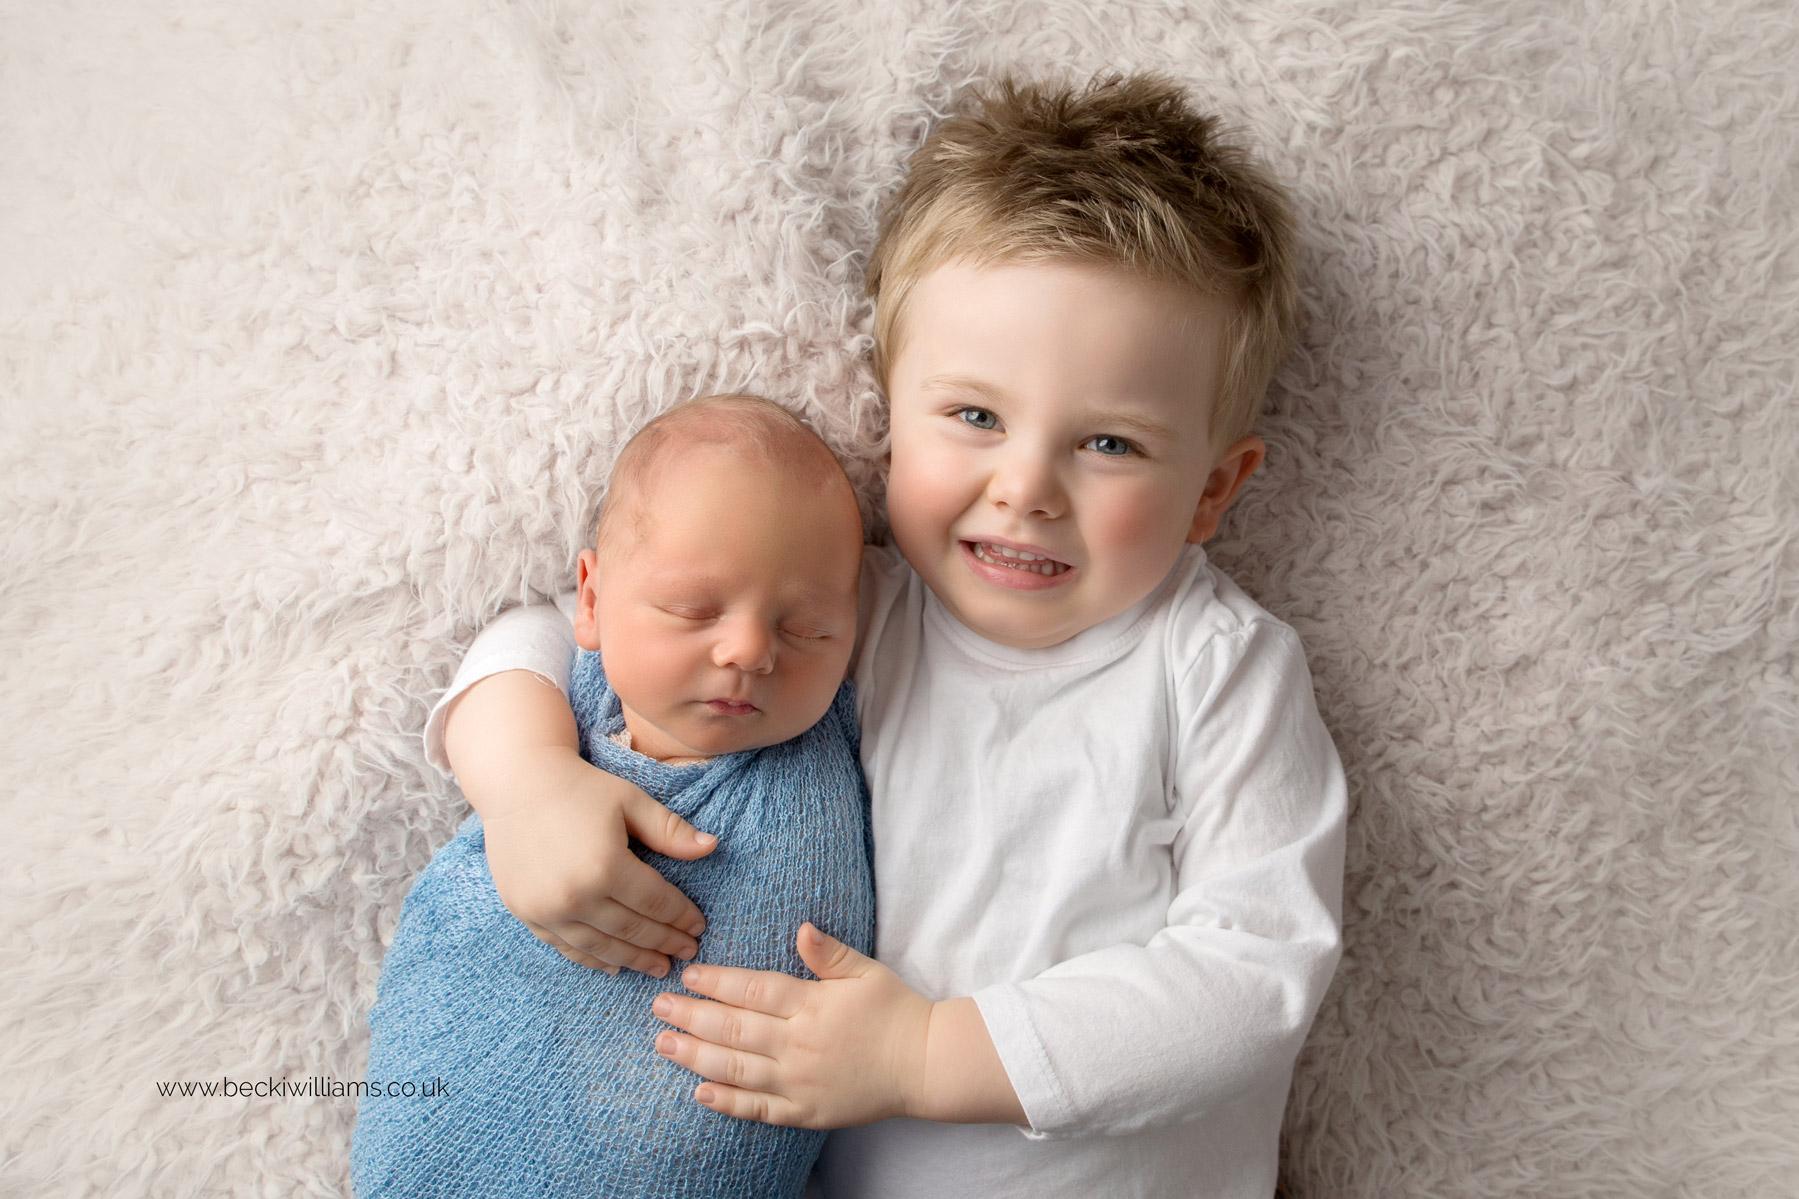 newborn-boy-portraits-hemel-hempstead-sibling-big-brother.jpg